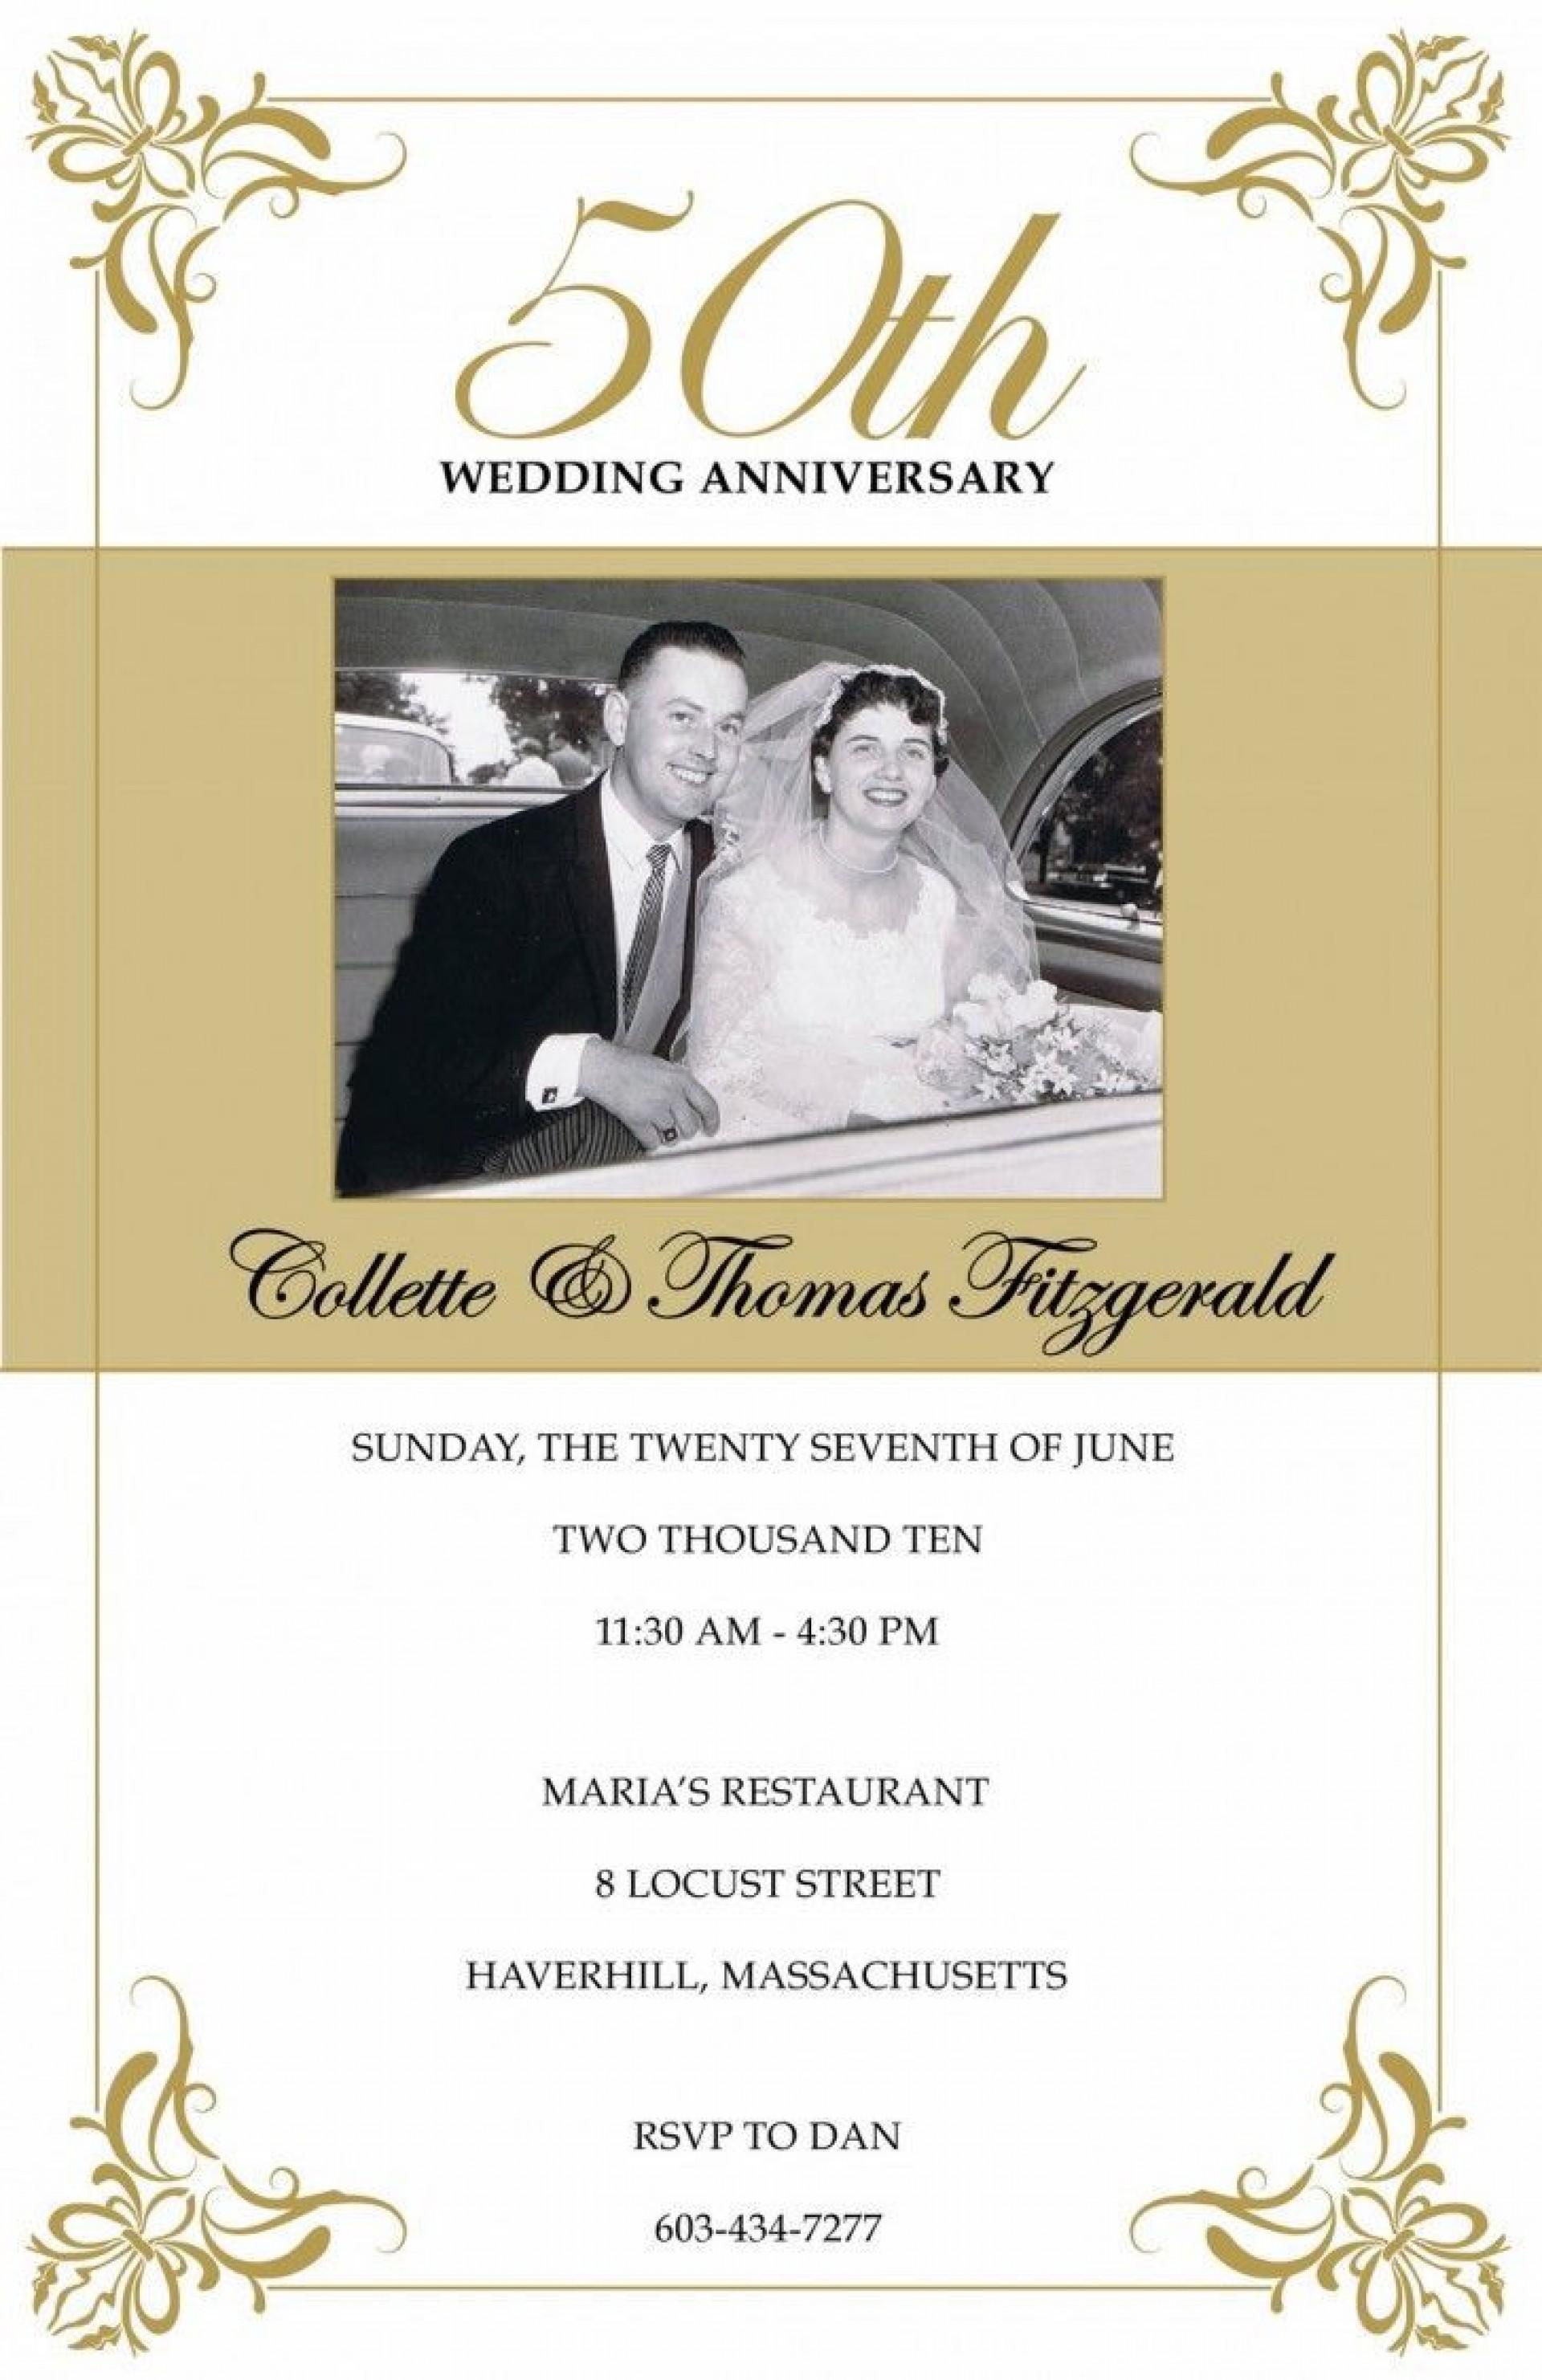 008 Shocking 50th Anniversary Invitation Design Idea  Designs Wedding Template Microsoft Word Surprise Party Wording Card1920